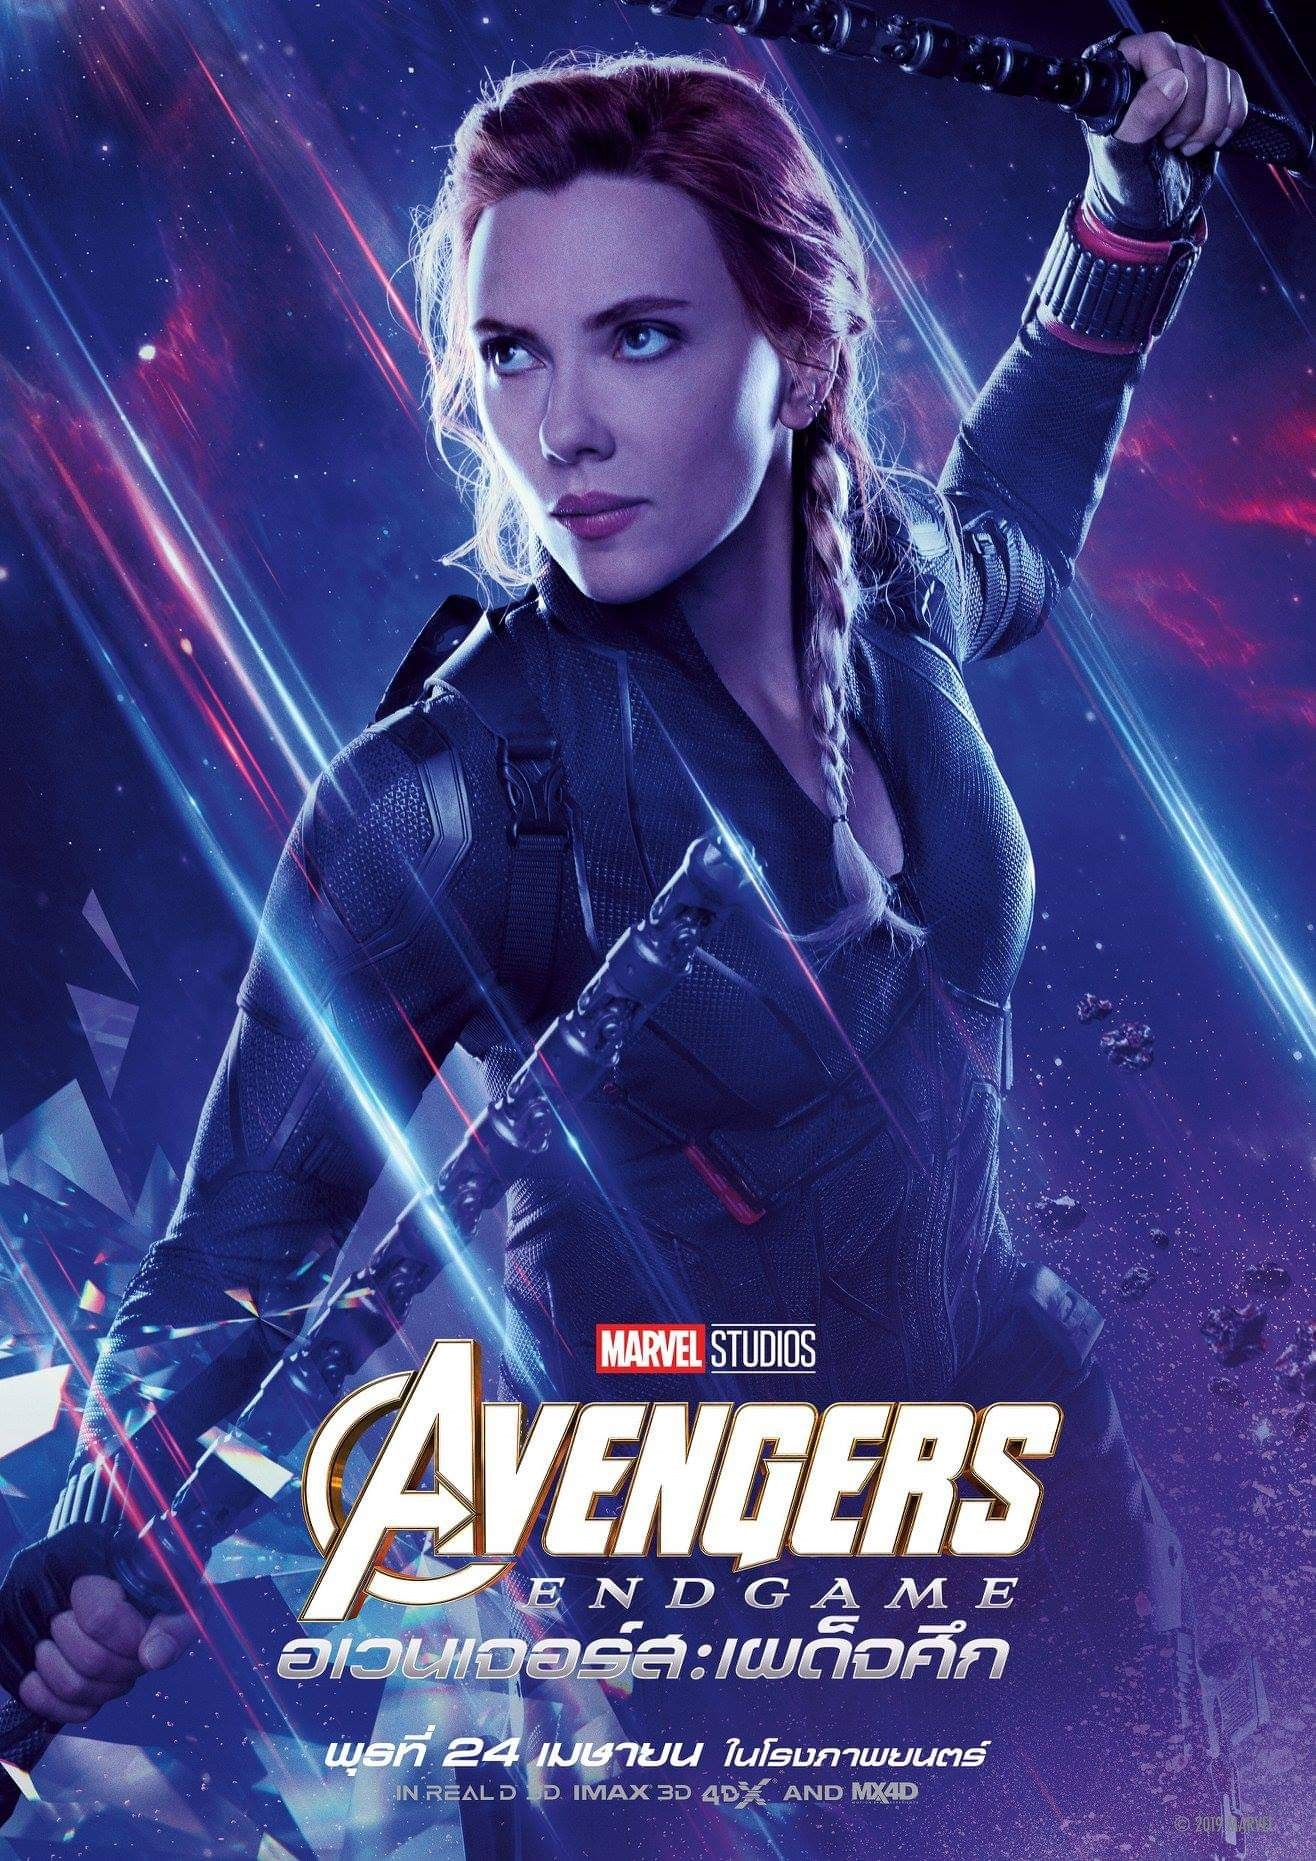 Endgame international character poster for Black Widow